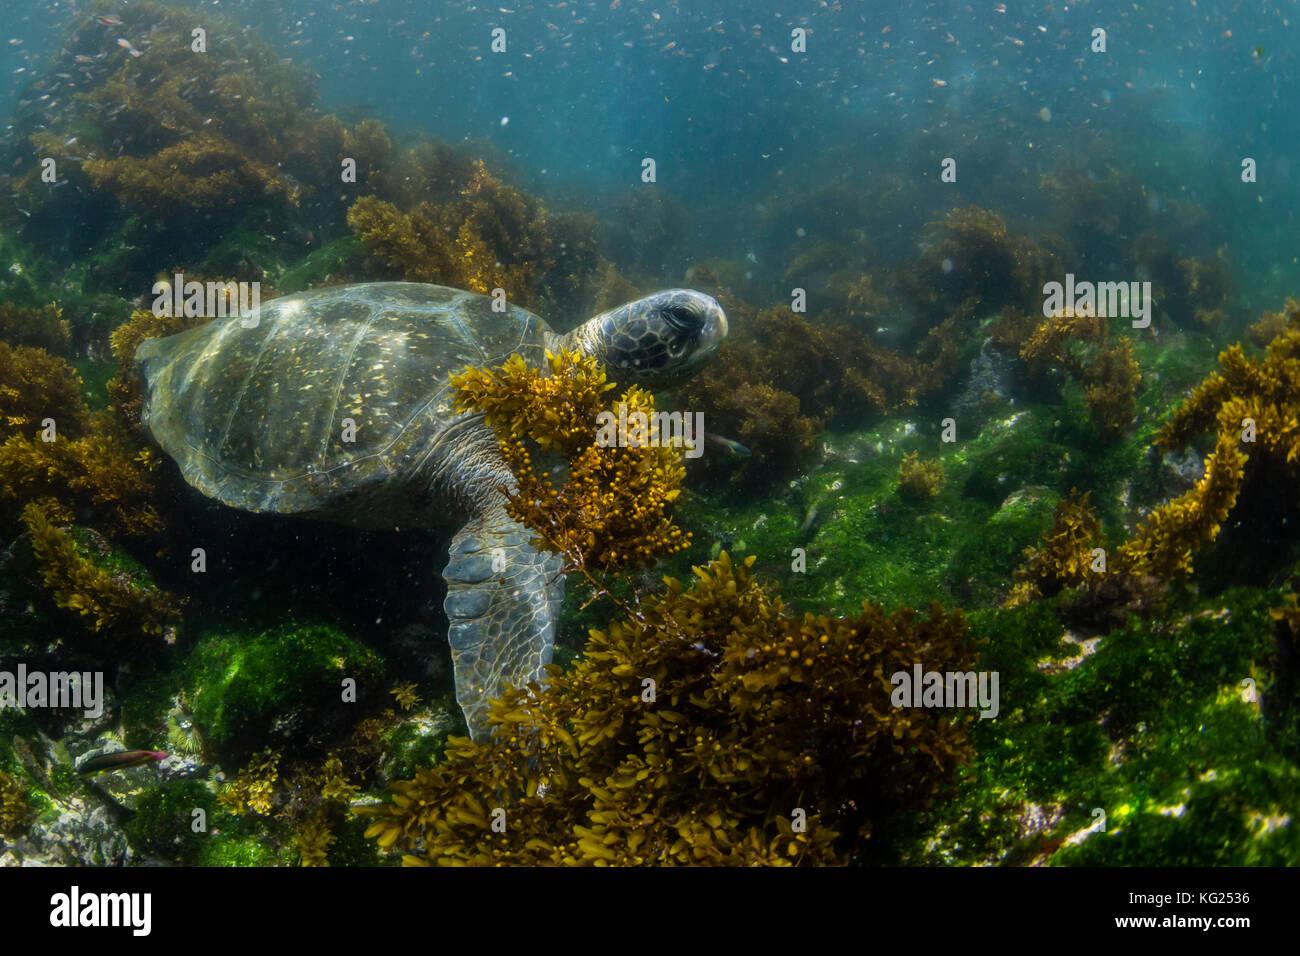 Pacific green sea turtle (Chelonia mydas) underwater on Fernandina Island, Galapagos, Ecuador, South America - Stock Image